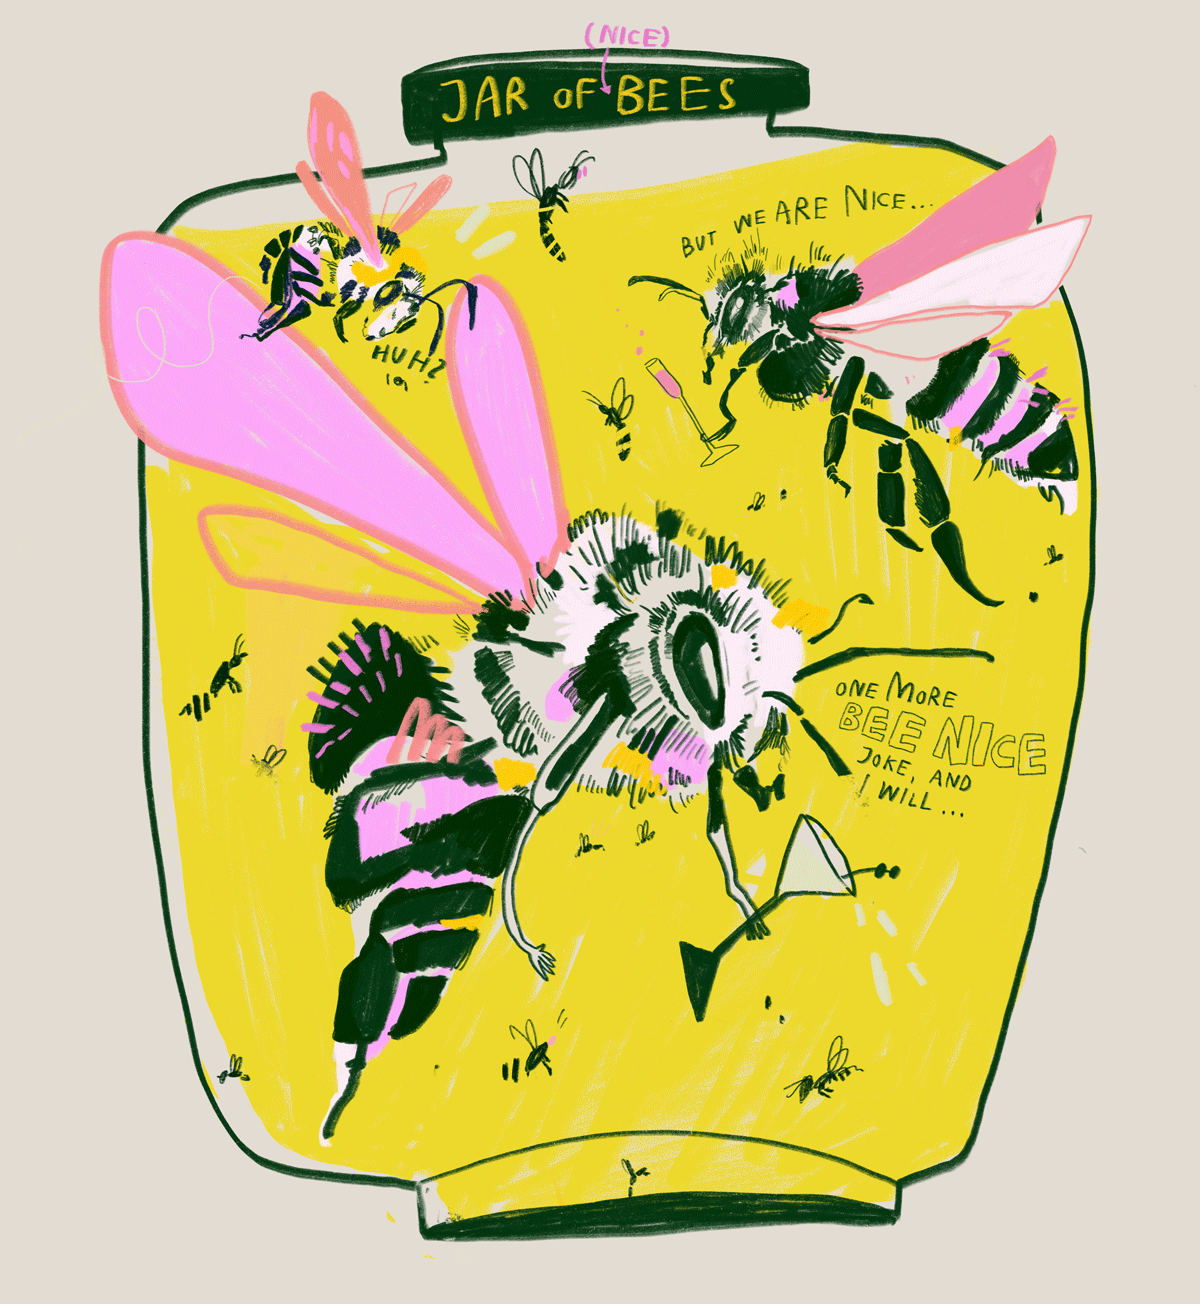 Jarofnicebees.png